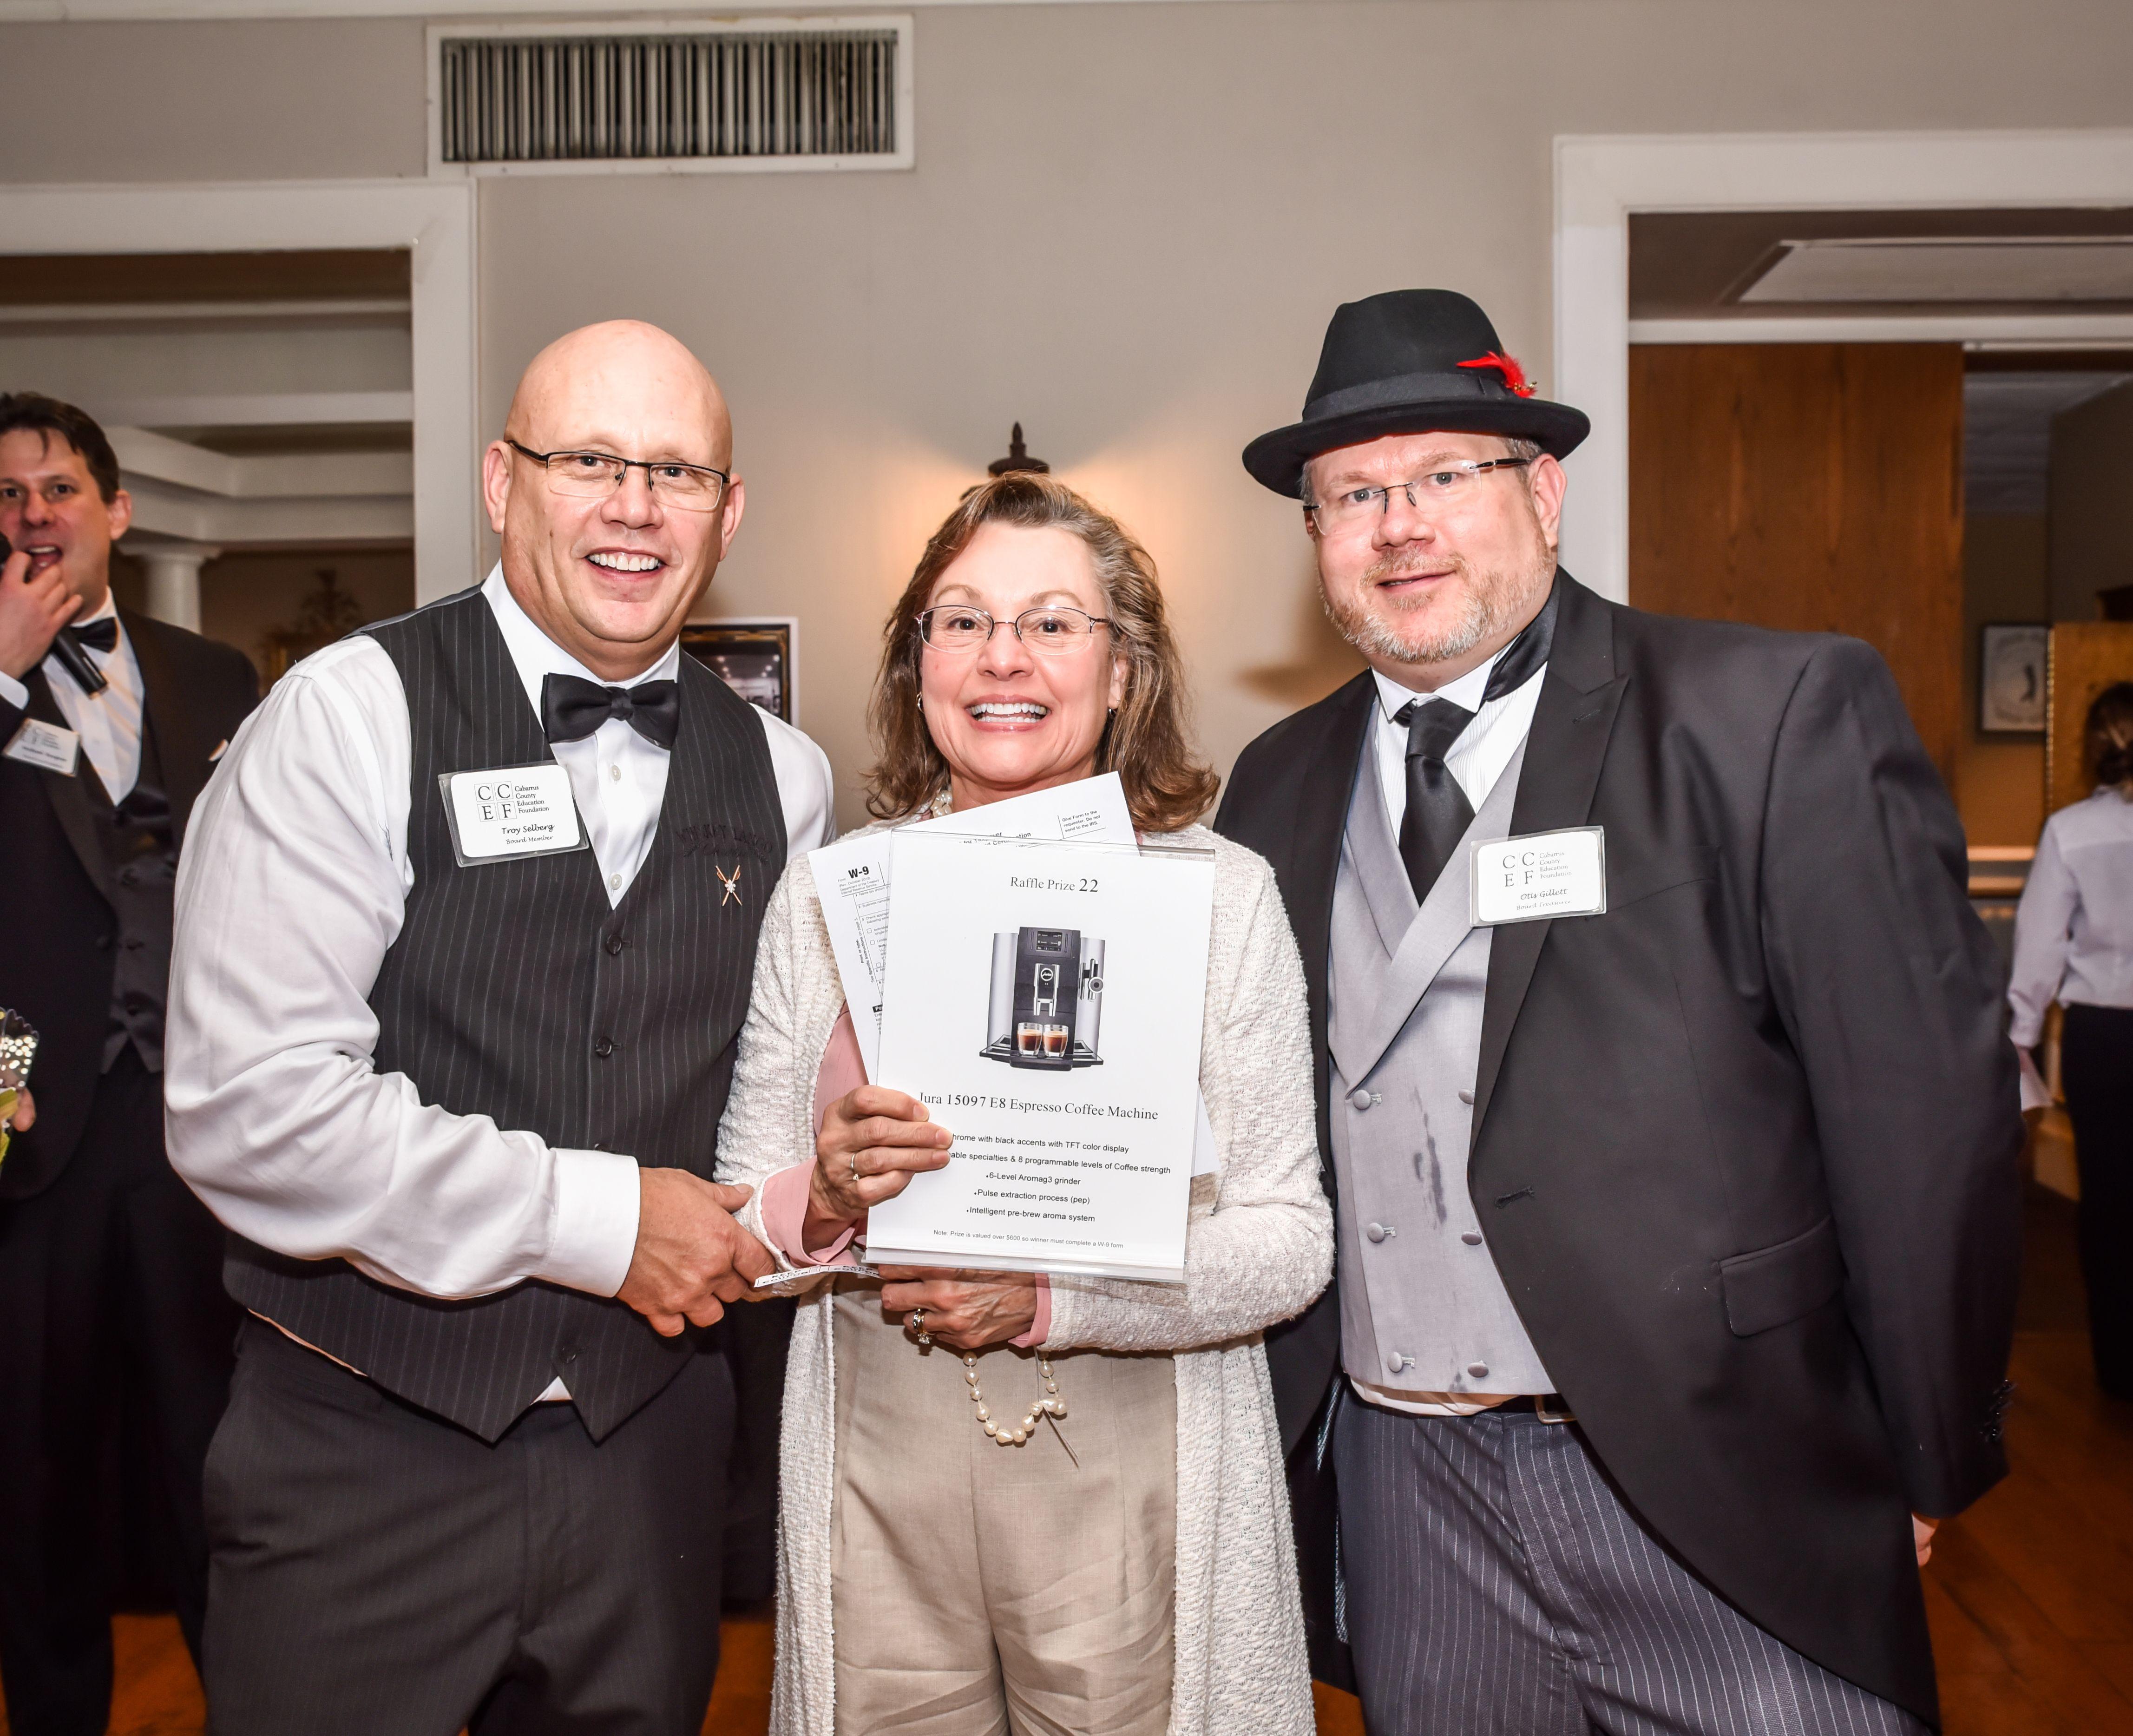 Jura Espresso Winner - Pam Wilkerson